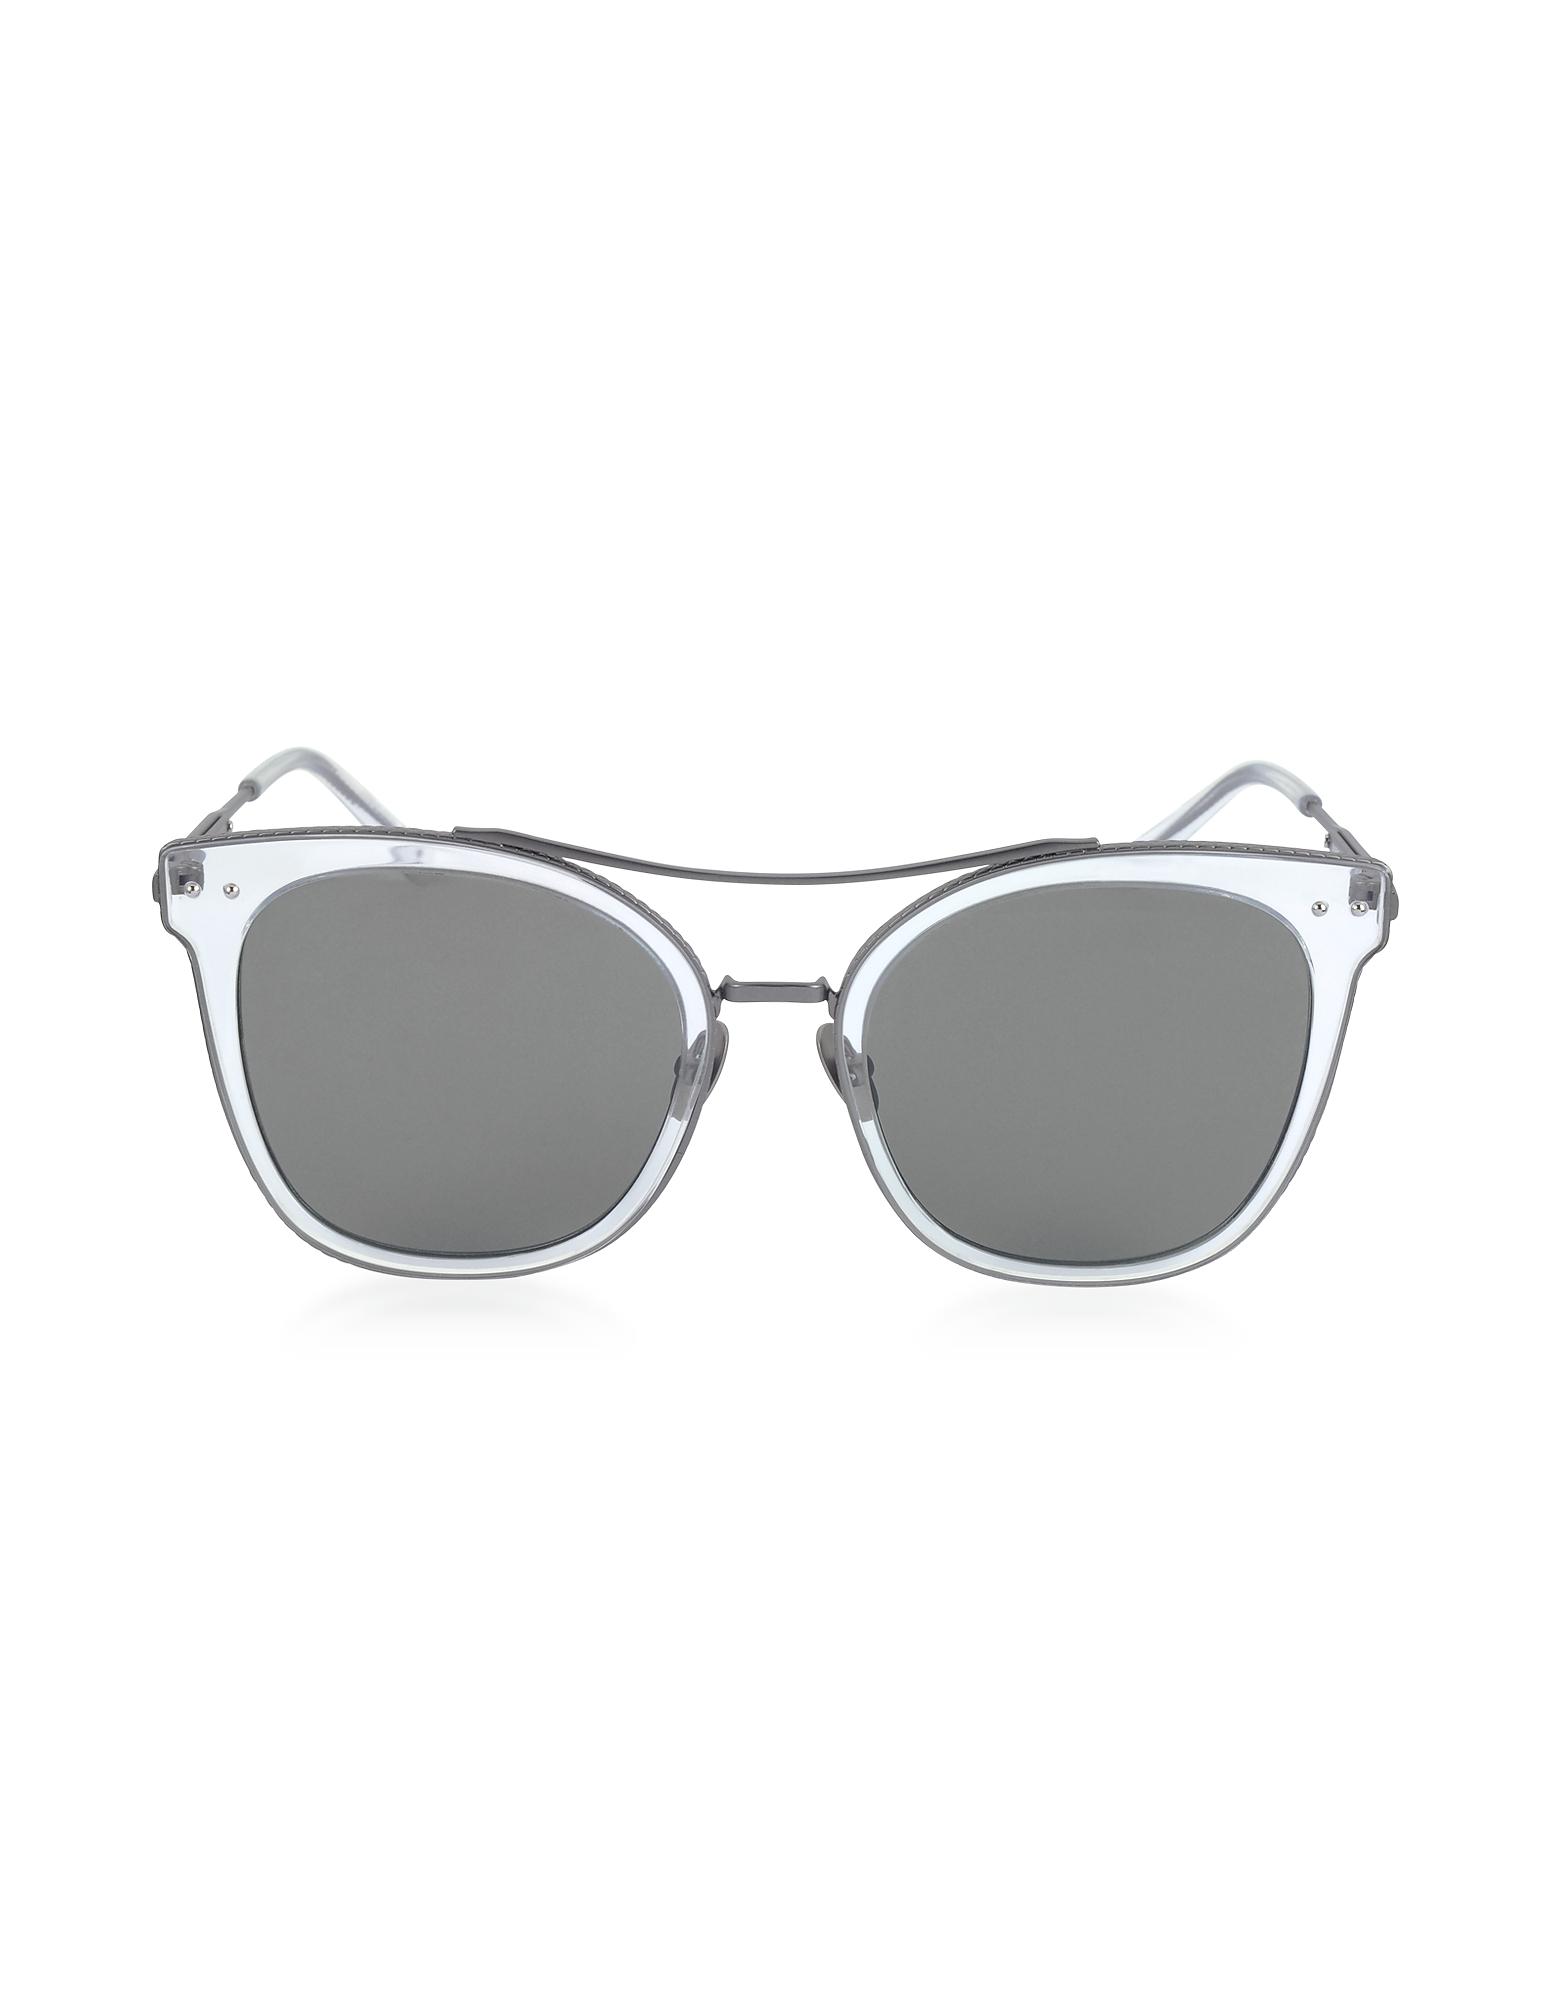 Bottega Veneta Designer Sunglasses, BV0064S Round Metal Frame Women's Sunglasses